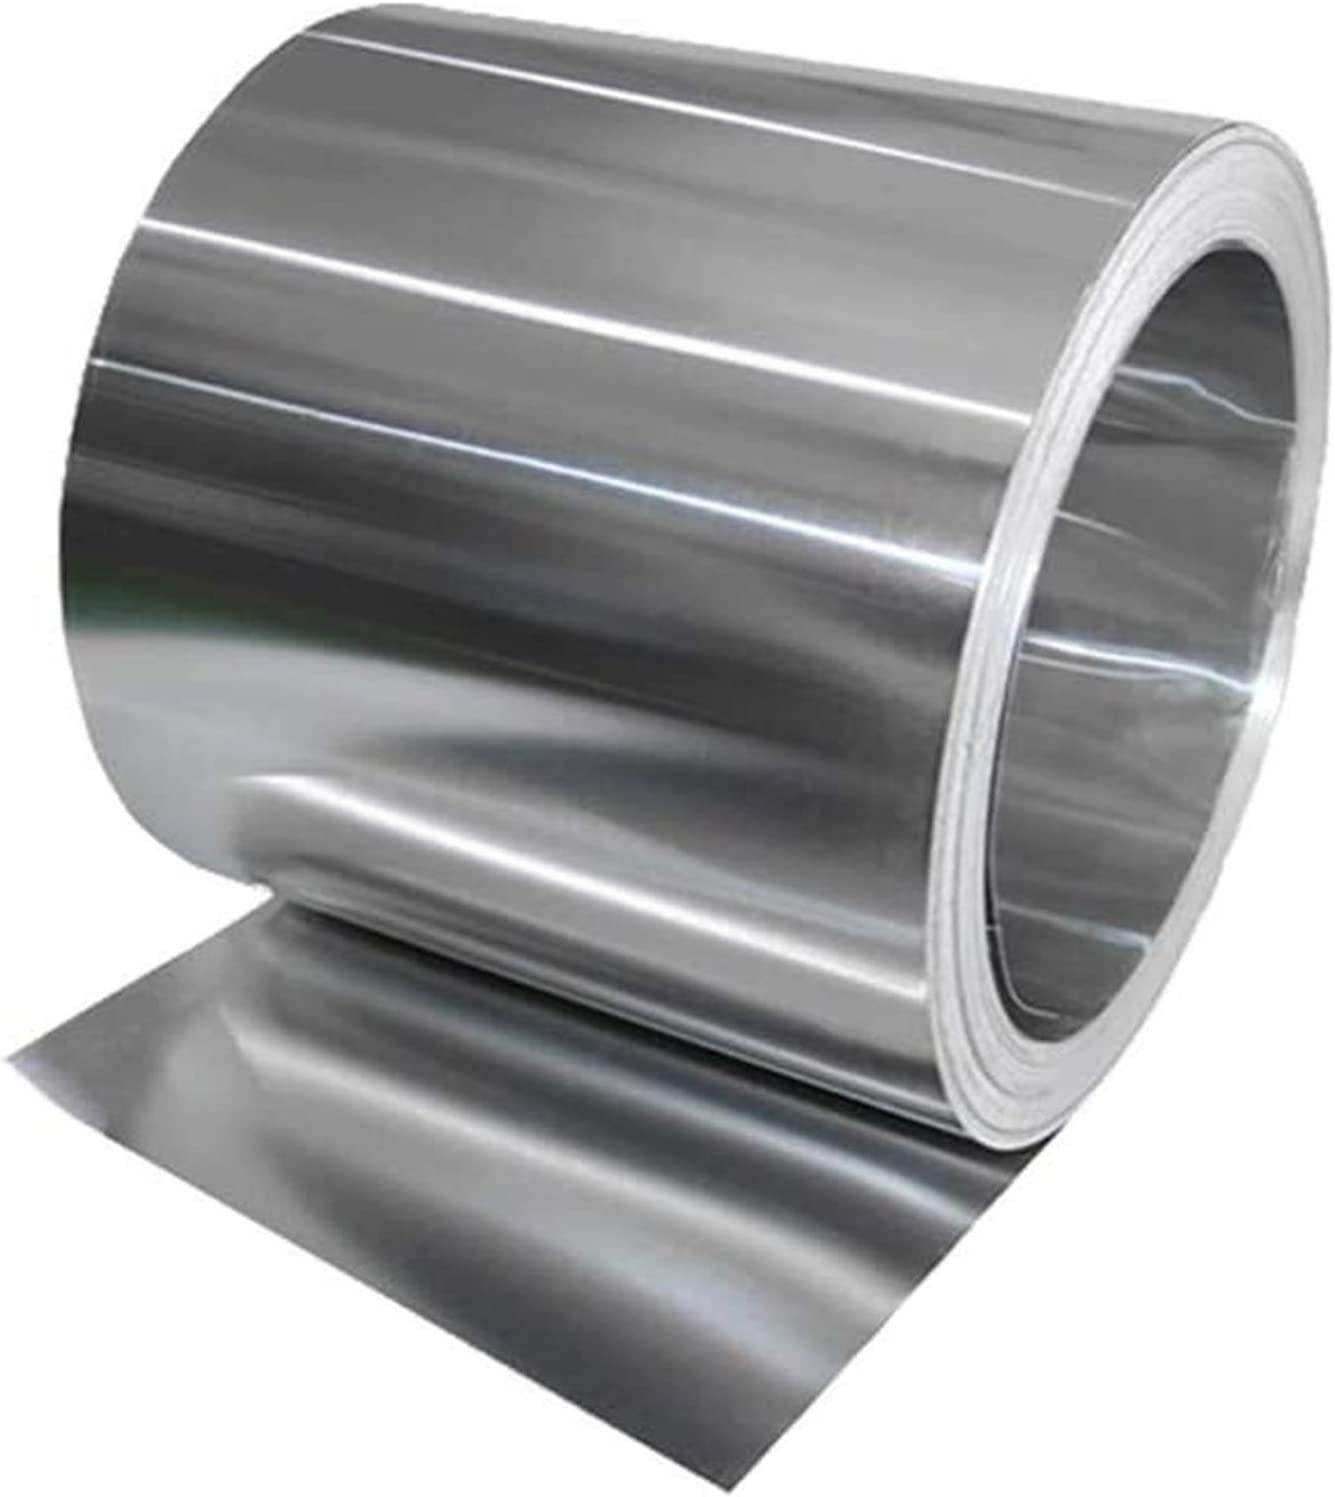 YUESFZ Brass Plate 1060 Aluminum Thin Foil Same day shipping Sheet Aluminium Limited time sale Strip